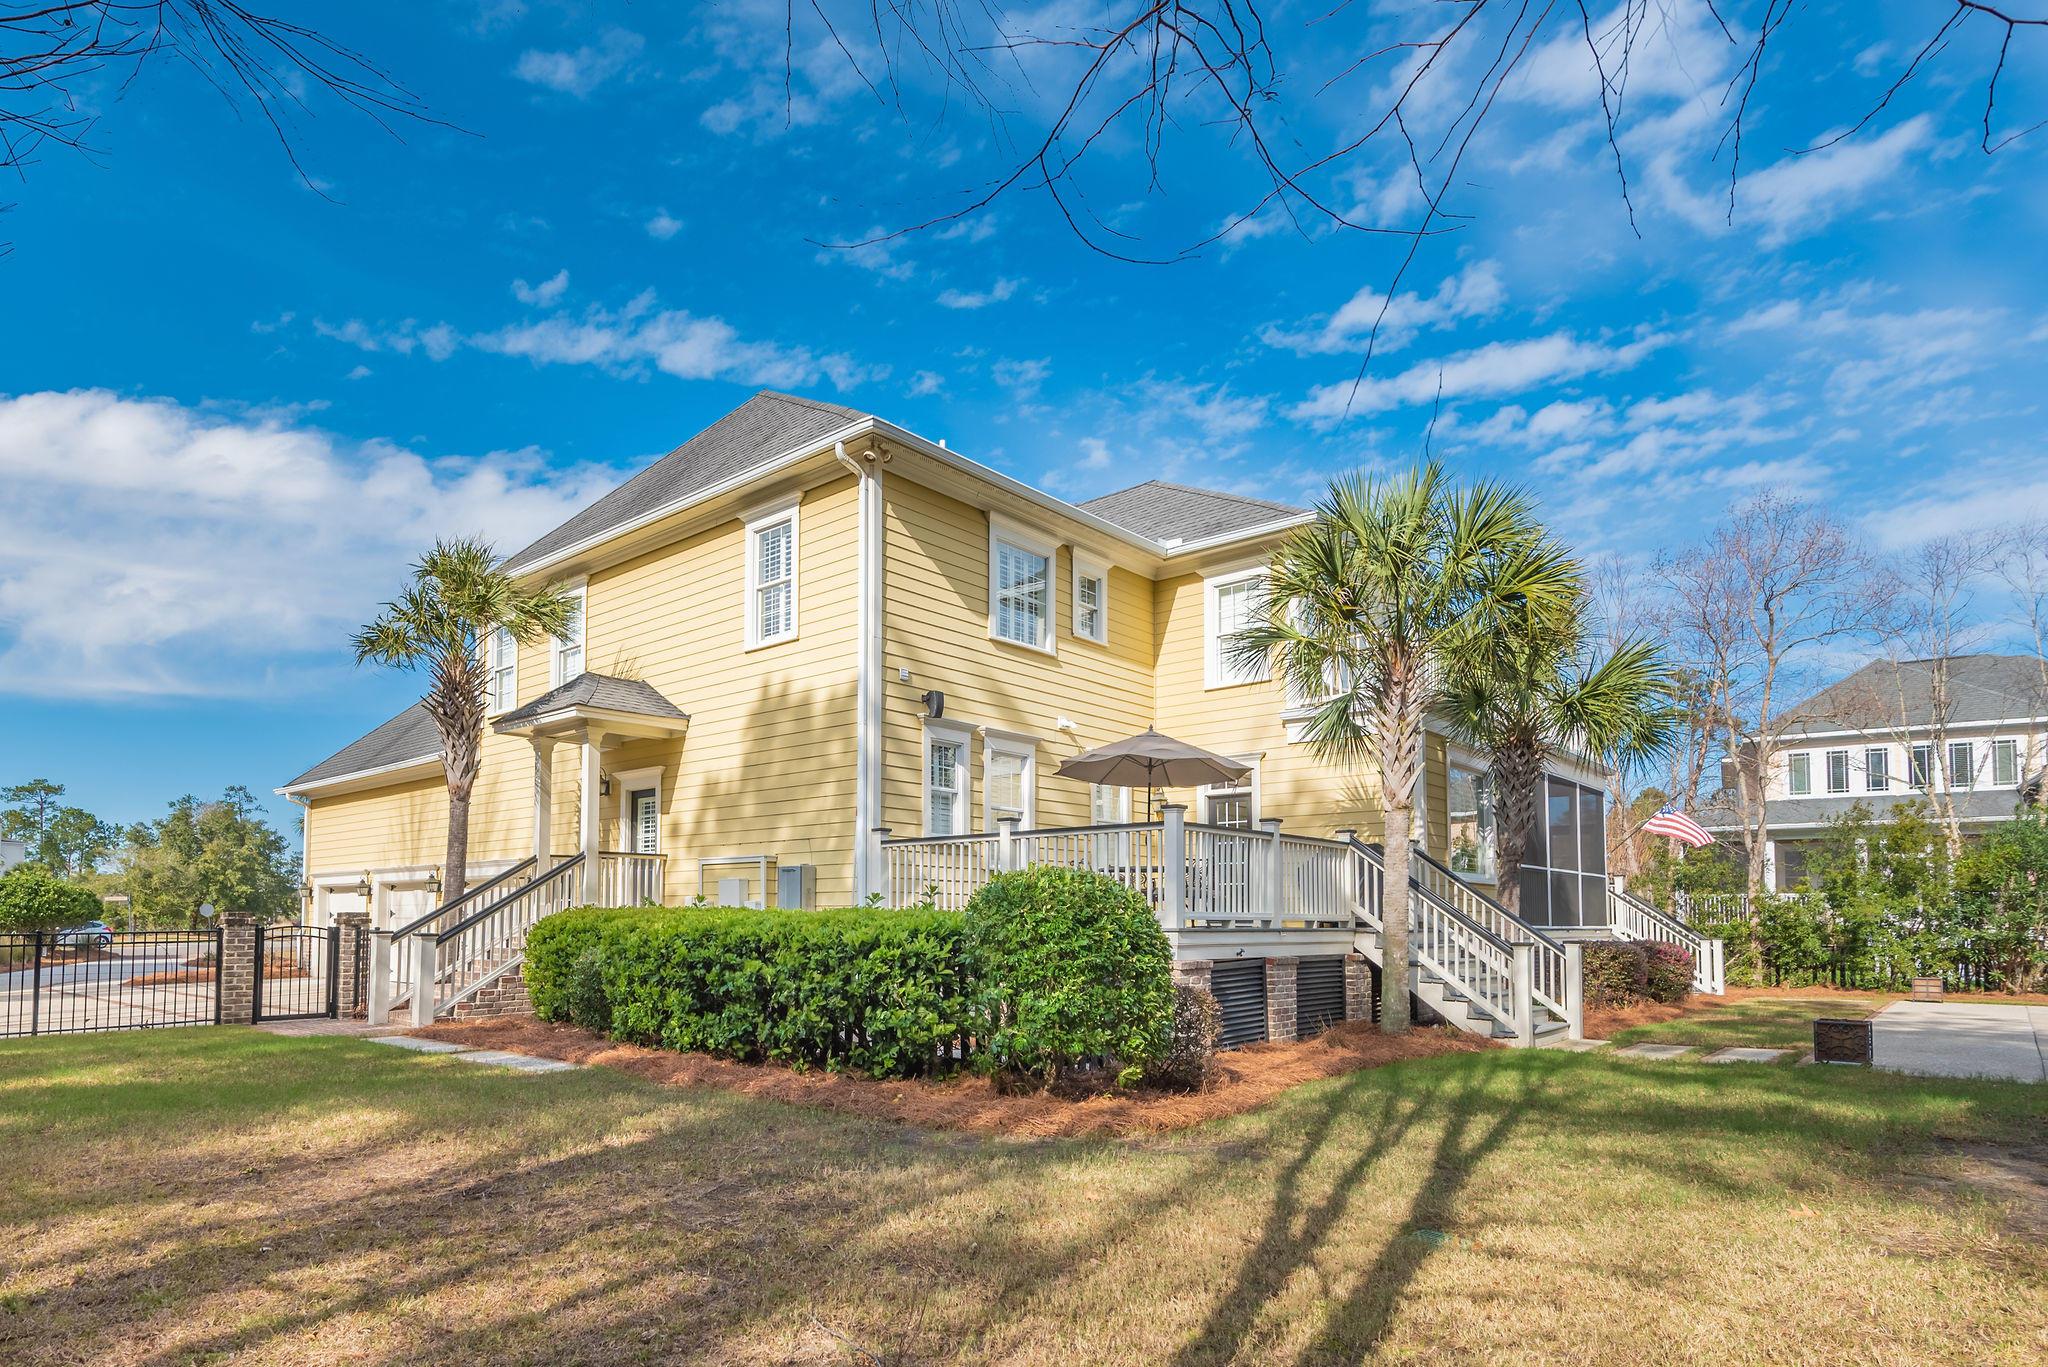 Dunes West Homes For Sale - 1305 King Bird, Mount Pleasant, SC - 25